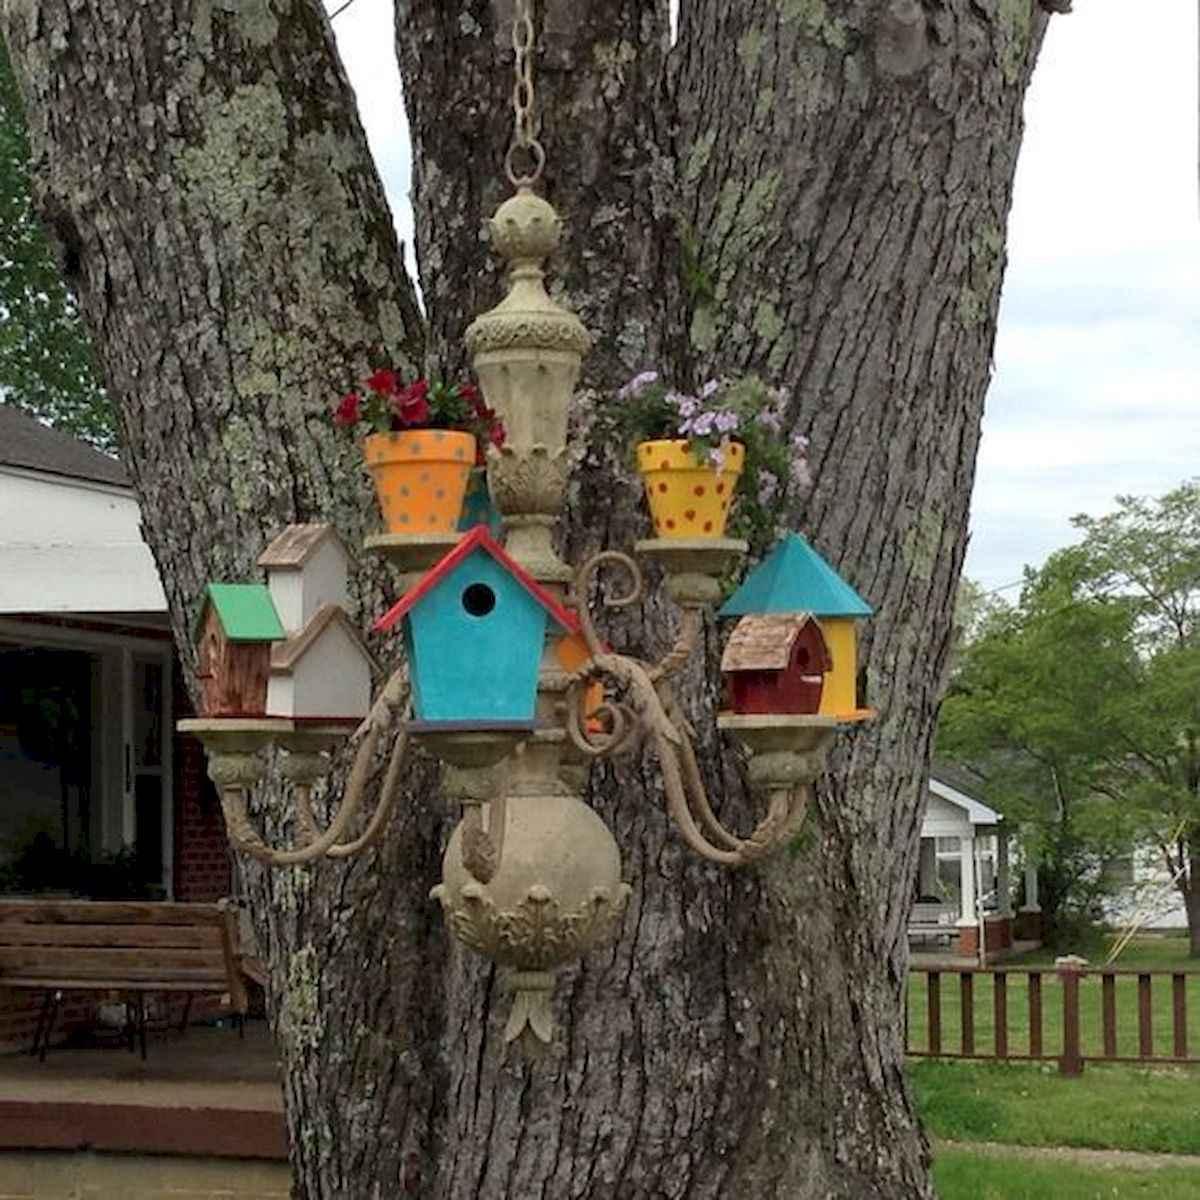 70 creative and genius garden art from junk design ideas for summer (23)